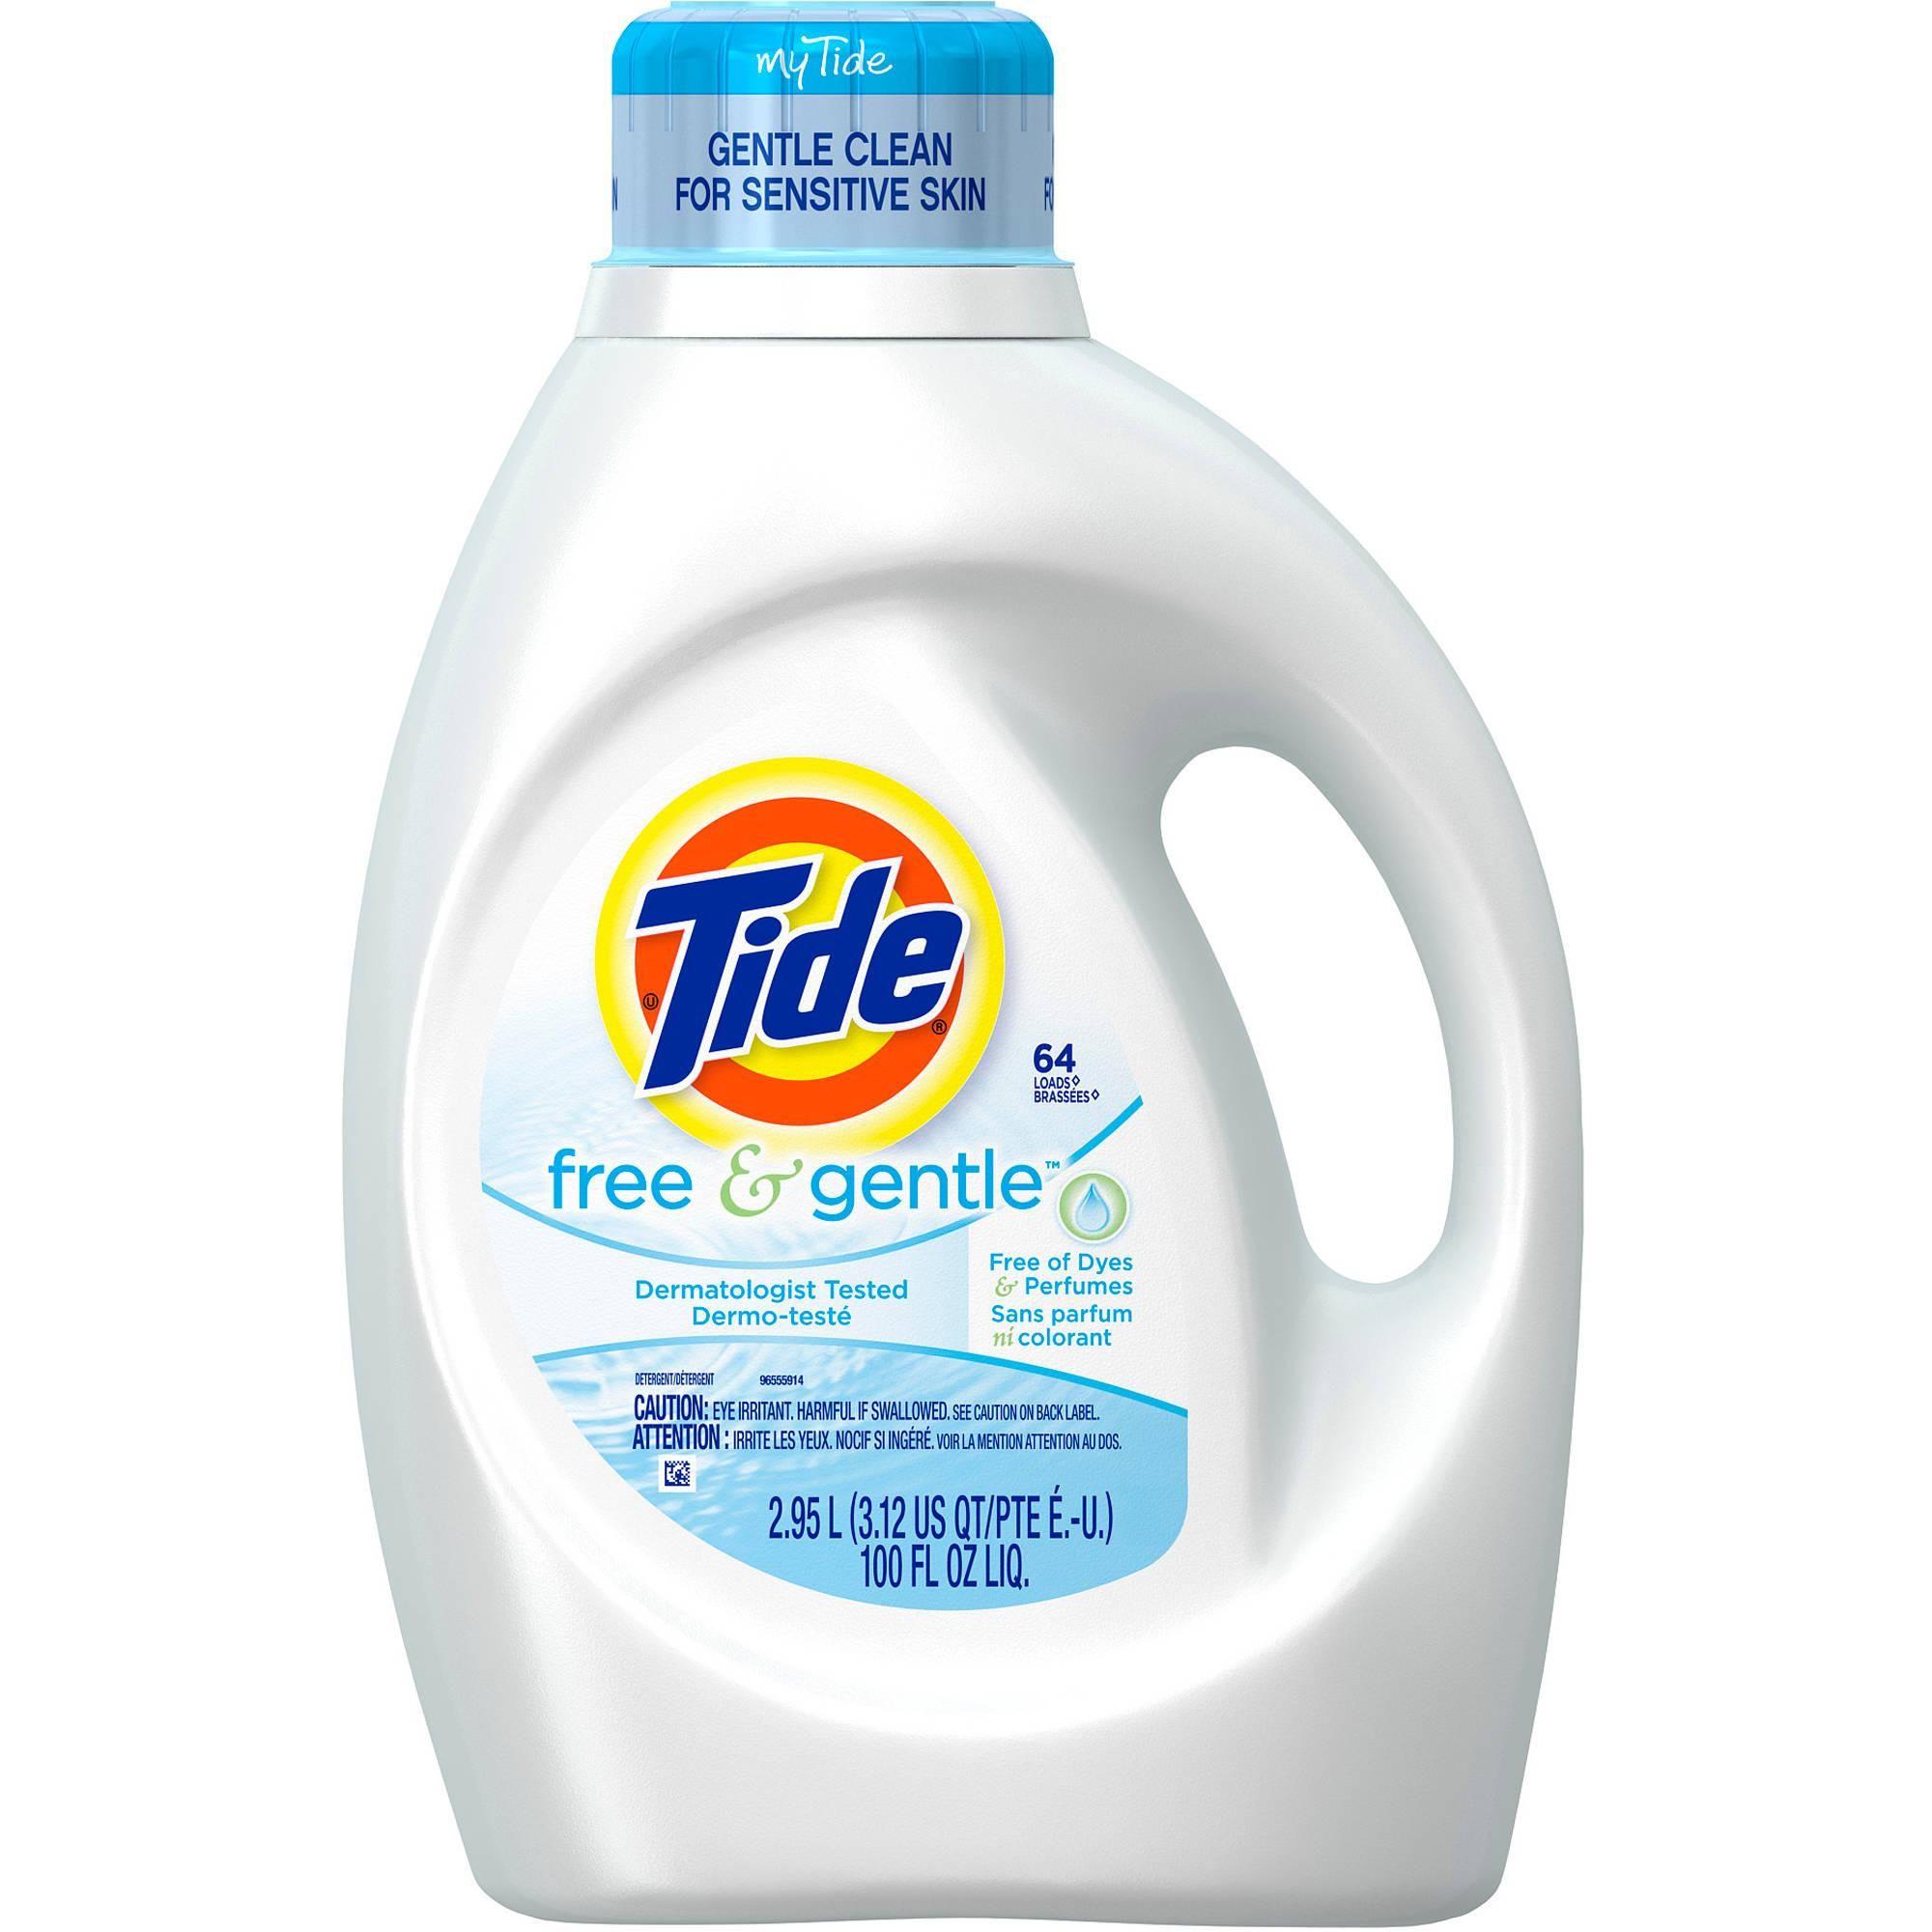 Tide Free Gentle Laundry Detergent Tide Laundry Detergent